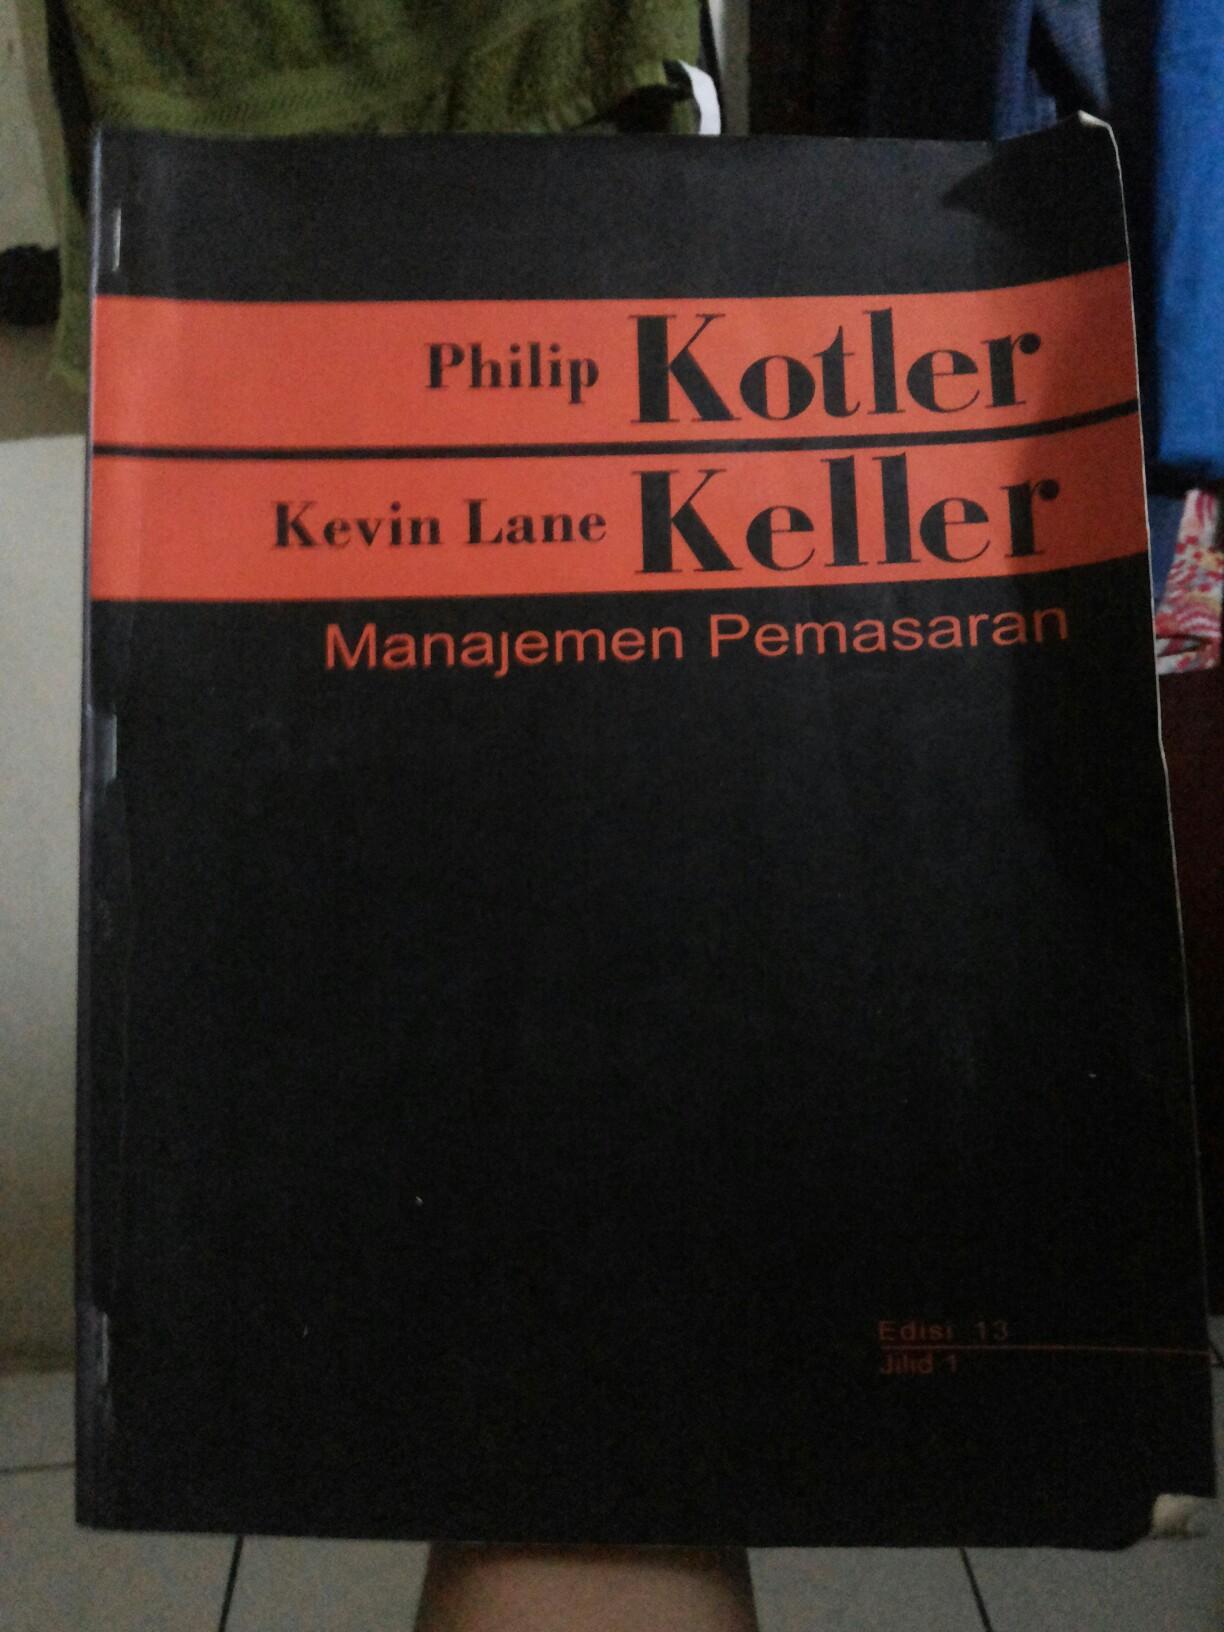 Buku Manajamen Pemasaran